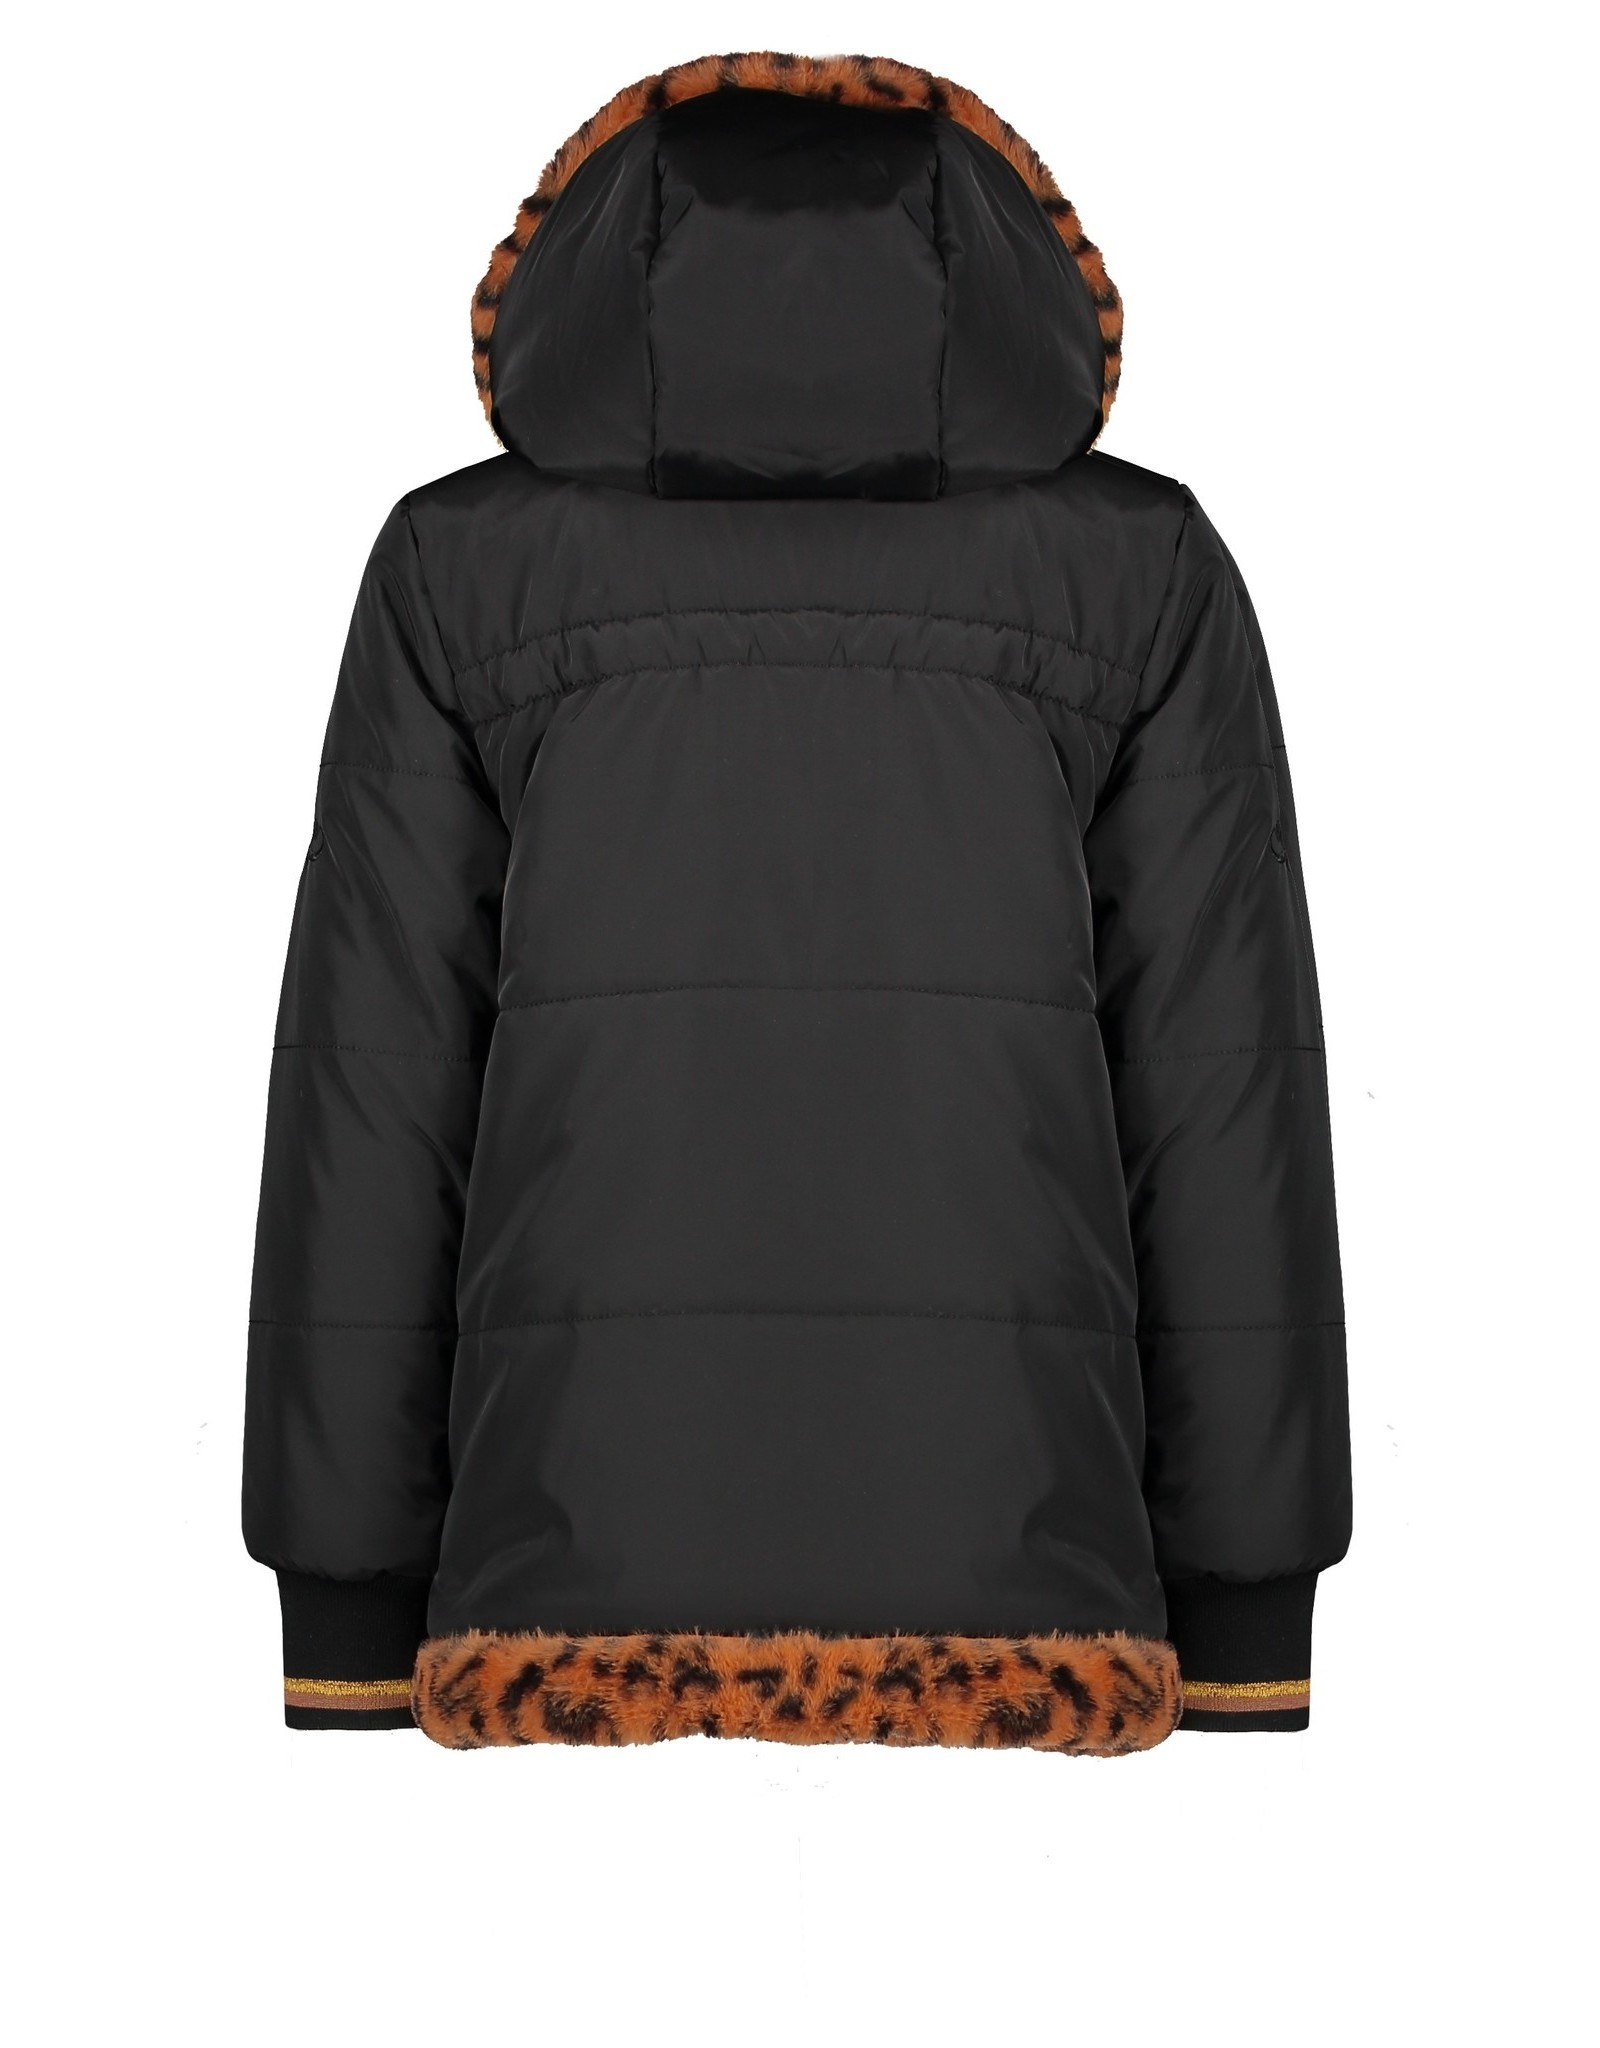 NONO NoNo Bay Mid Long Reversible Hooded A-line Jacket